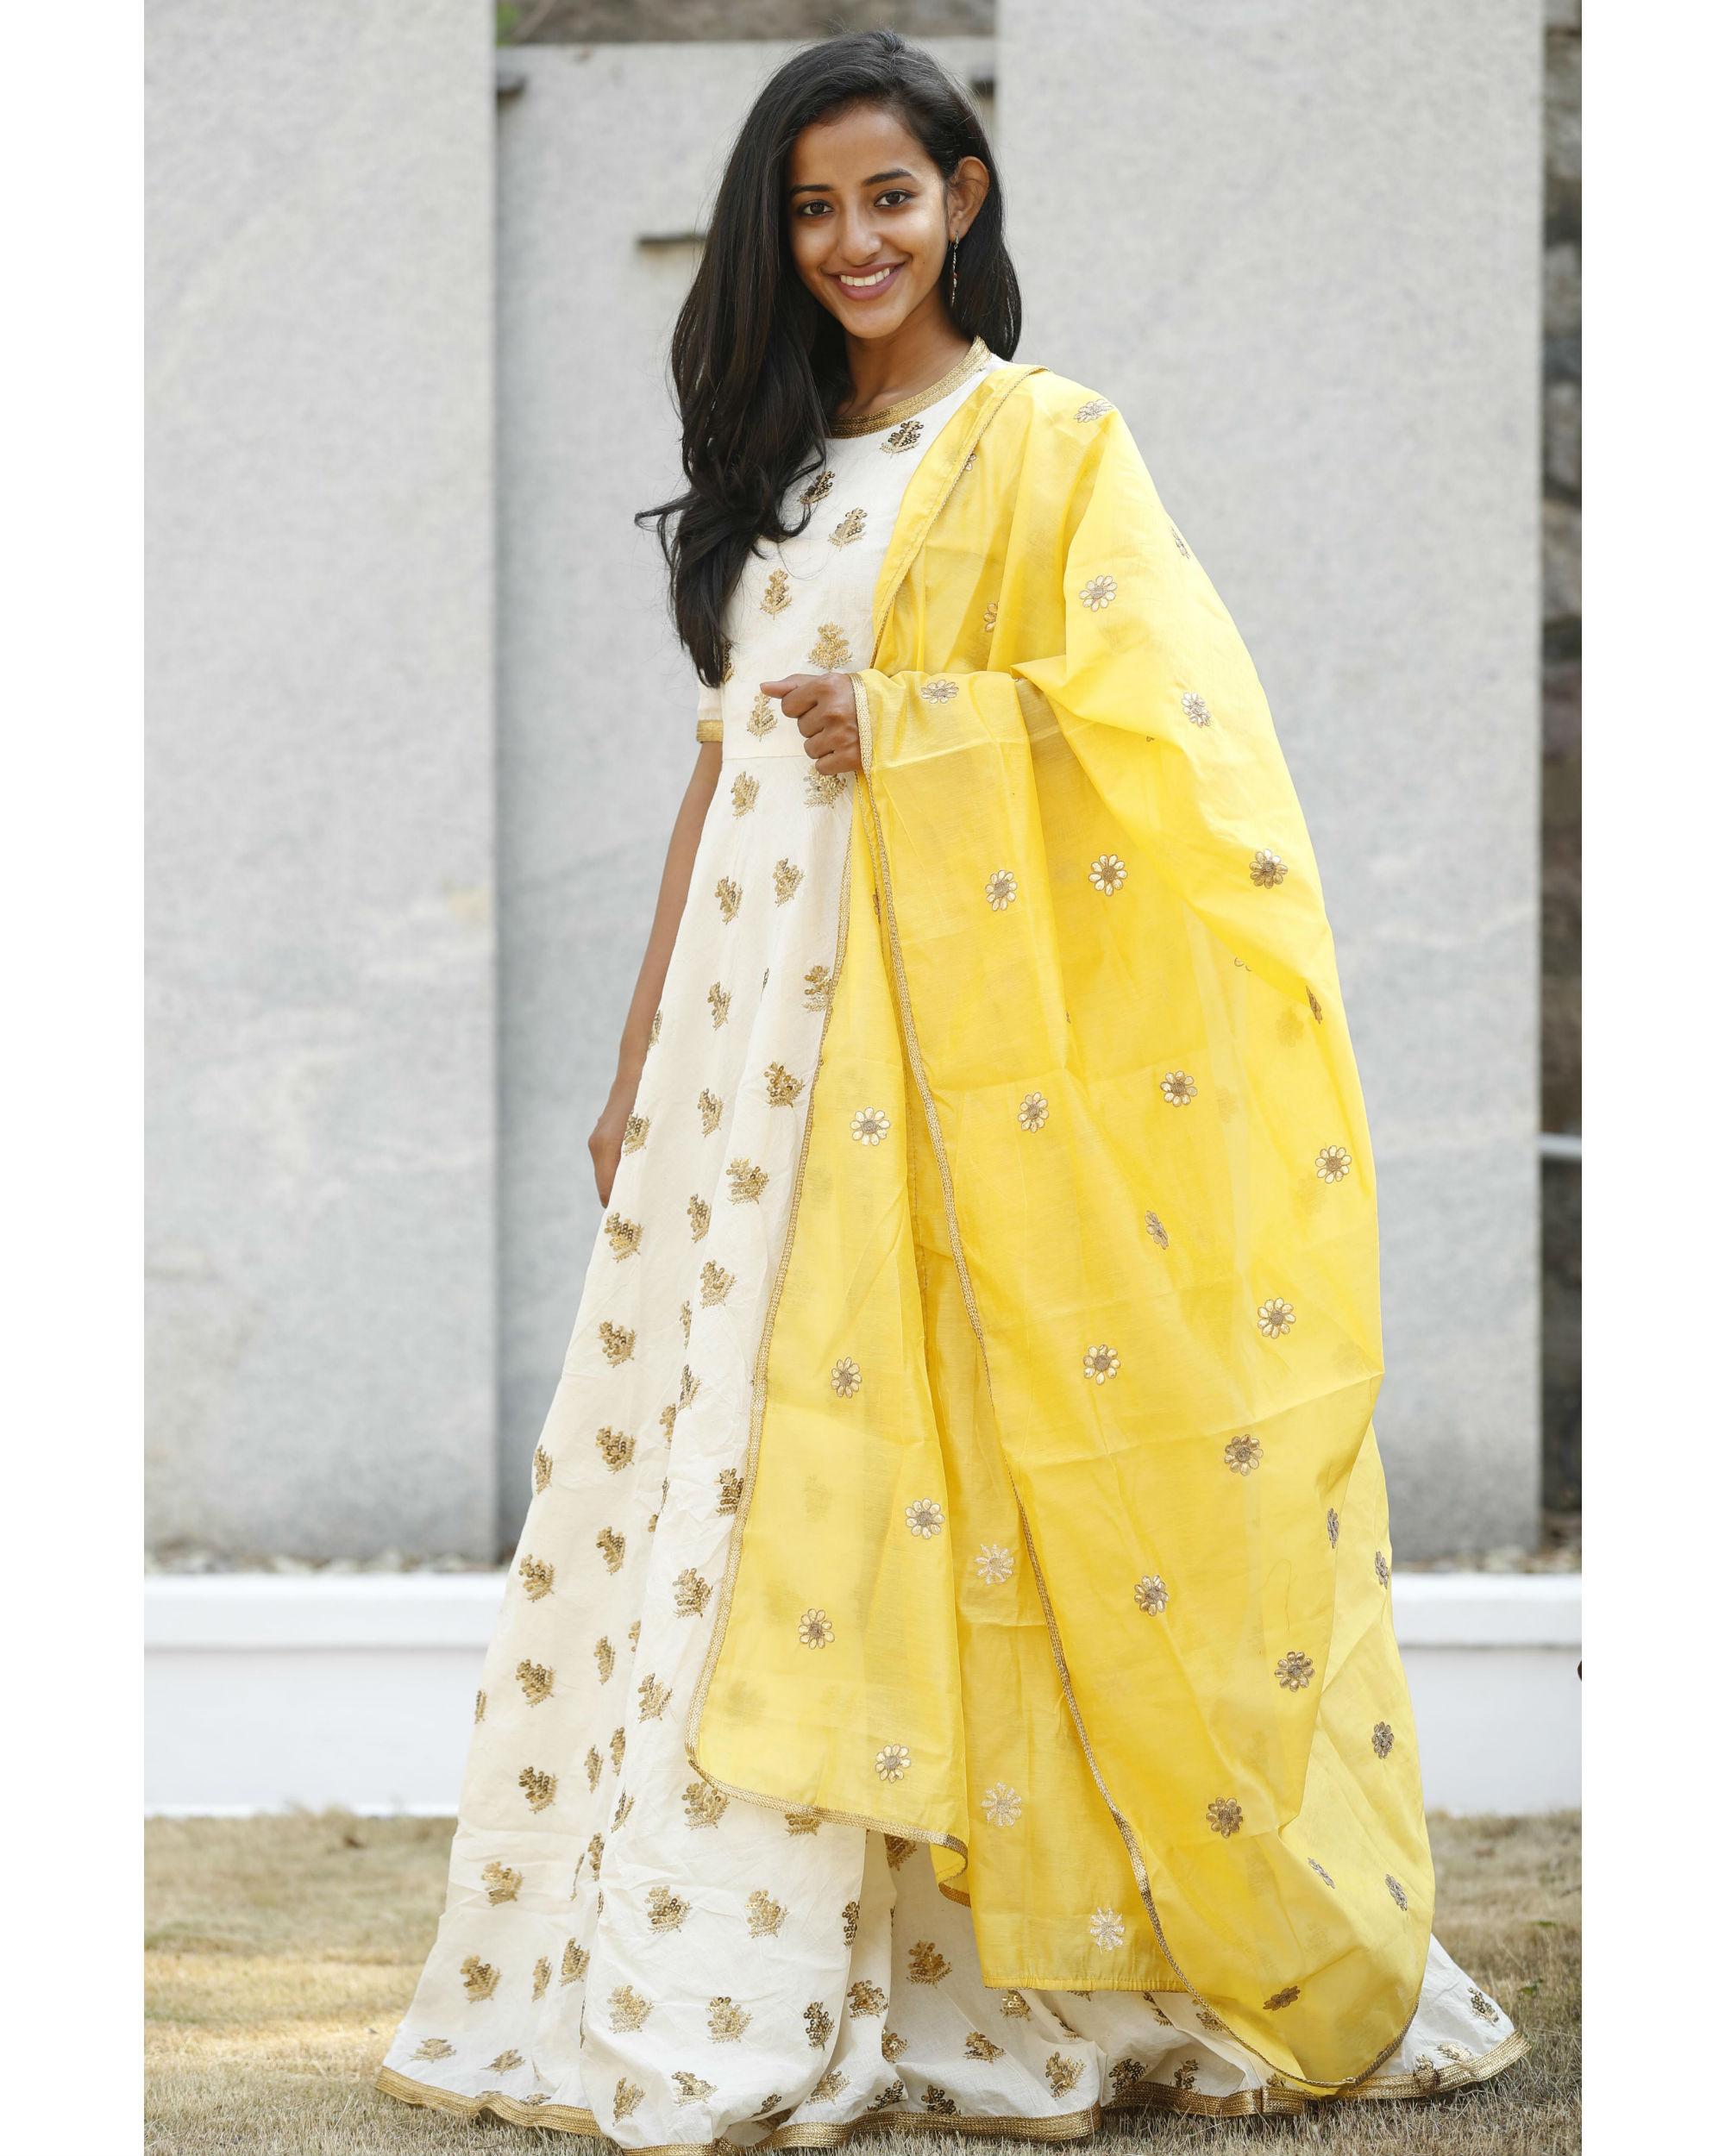 8ae6f80b1c58 Desi gold yellow dress with dupatta by Tie & Dye Tale   The Secret Label